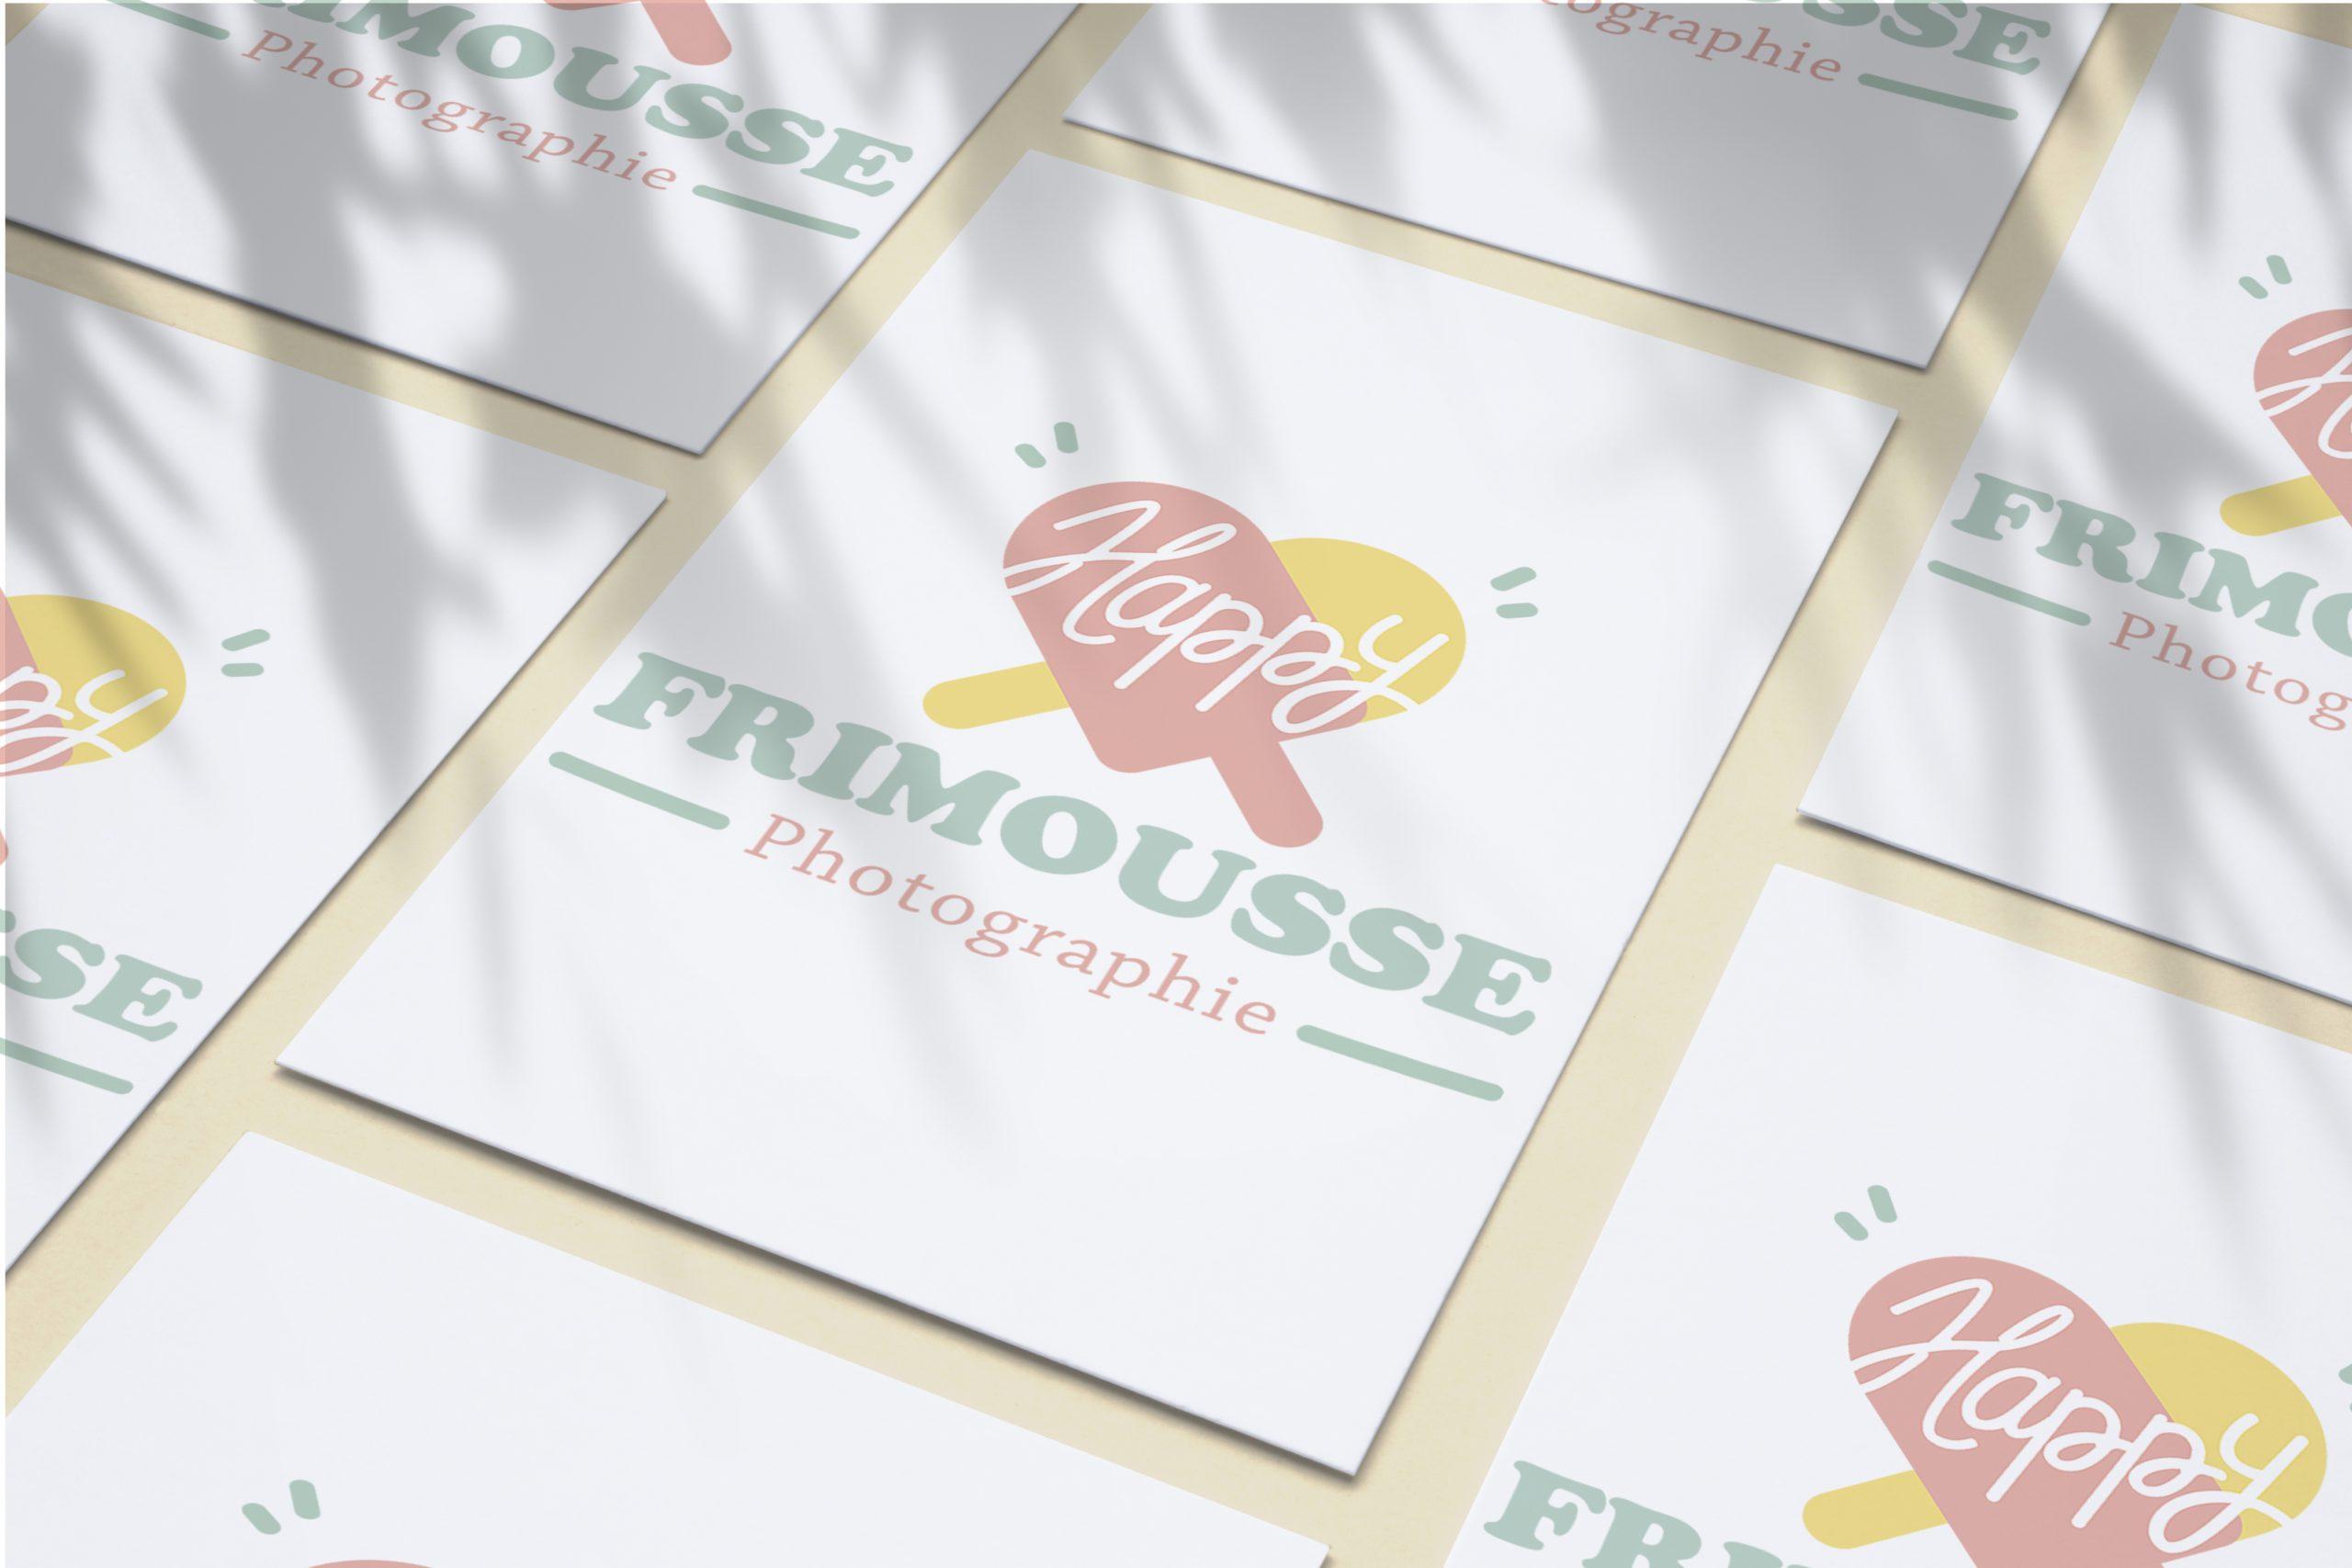 logo Happy frimousse photographie